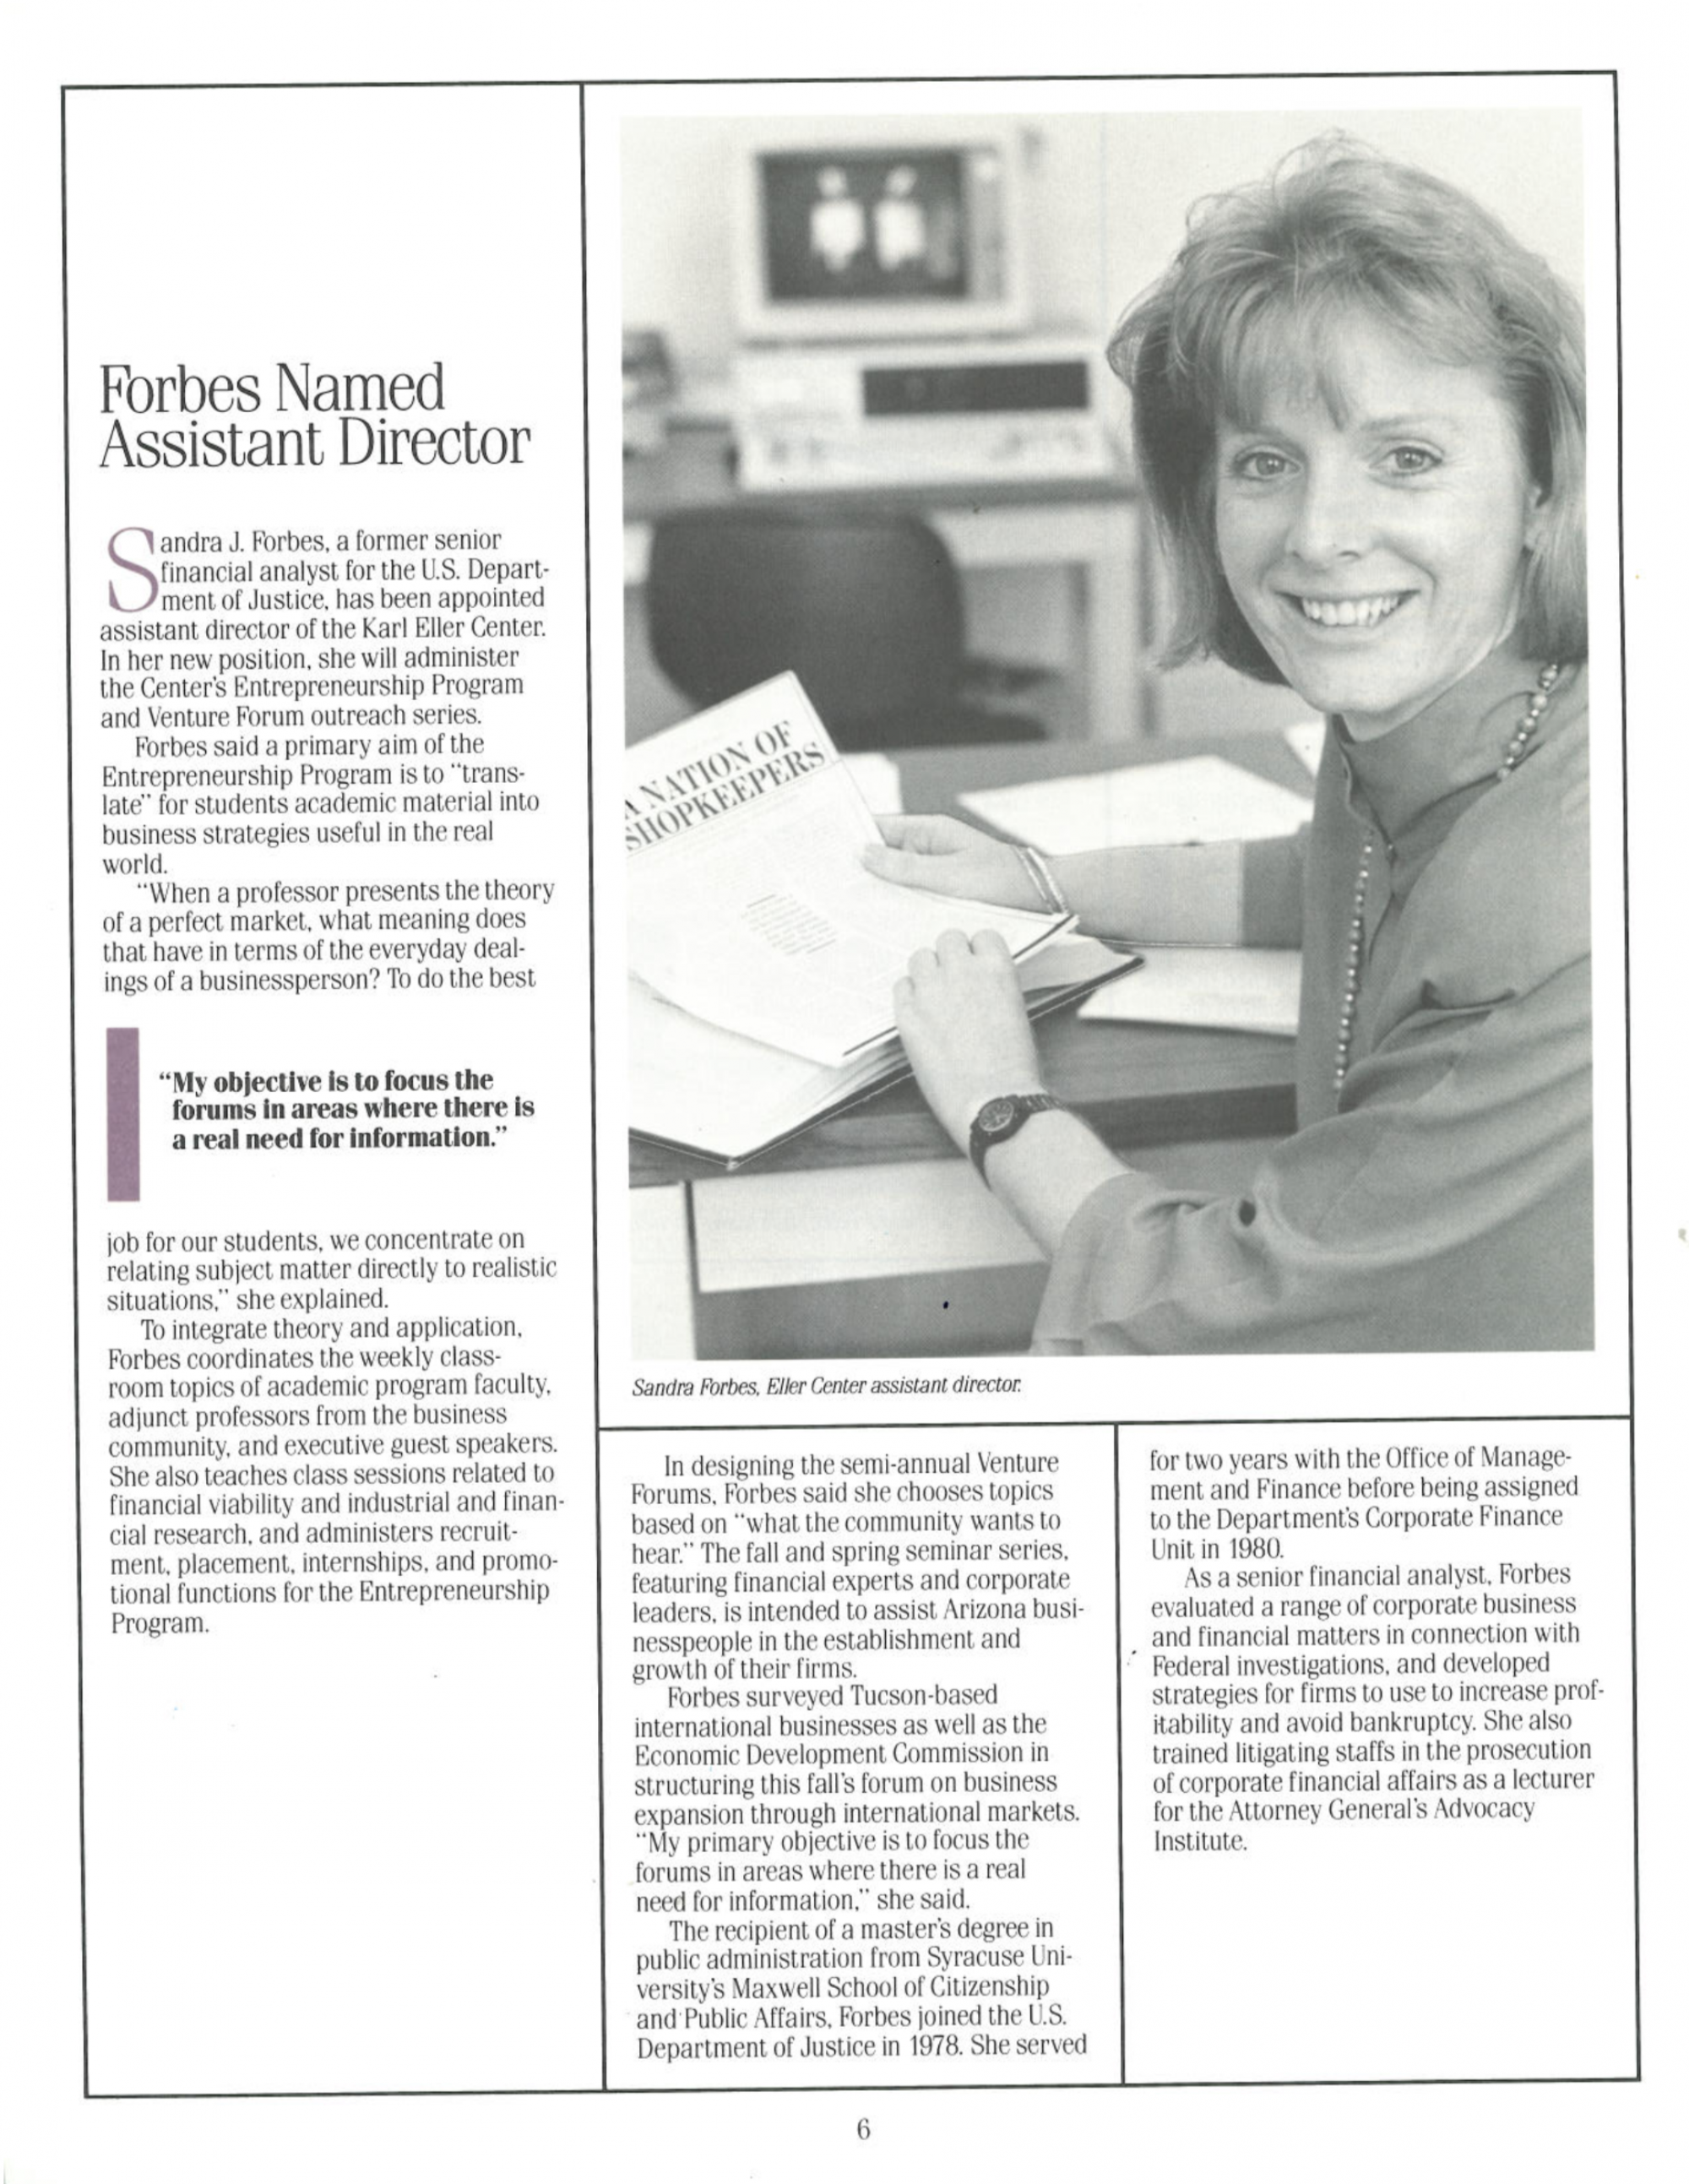 1988- Fall issue of Enterprise, the publication of the Karl Eller Center